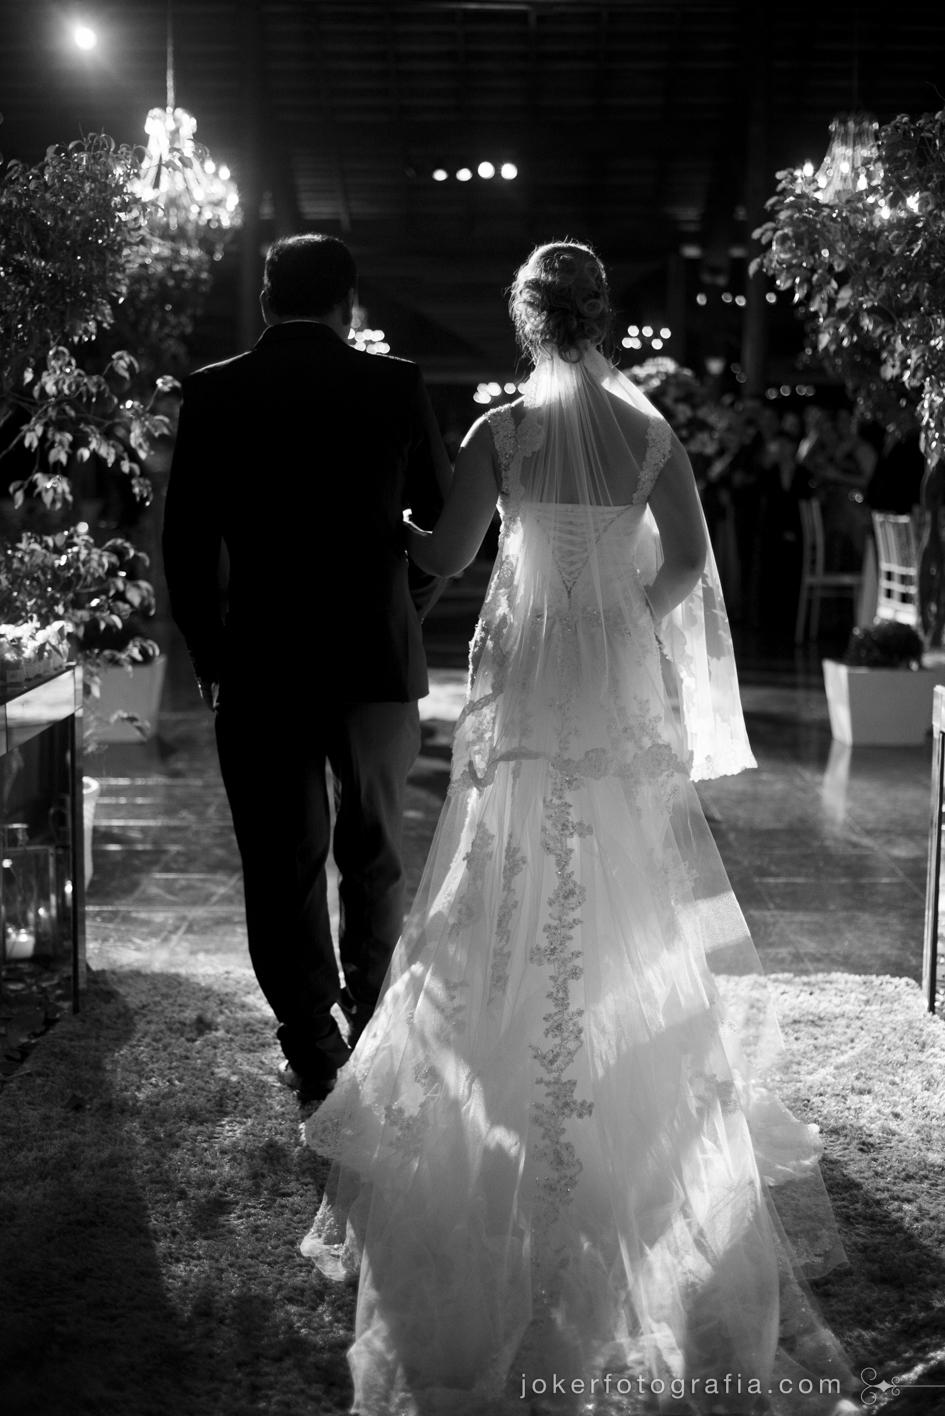 maravilhoso vestido de noiva com transparência, renda, cauda e véu longo por NIlma Noivas